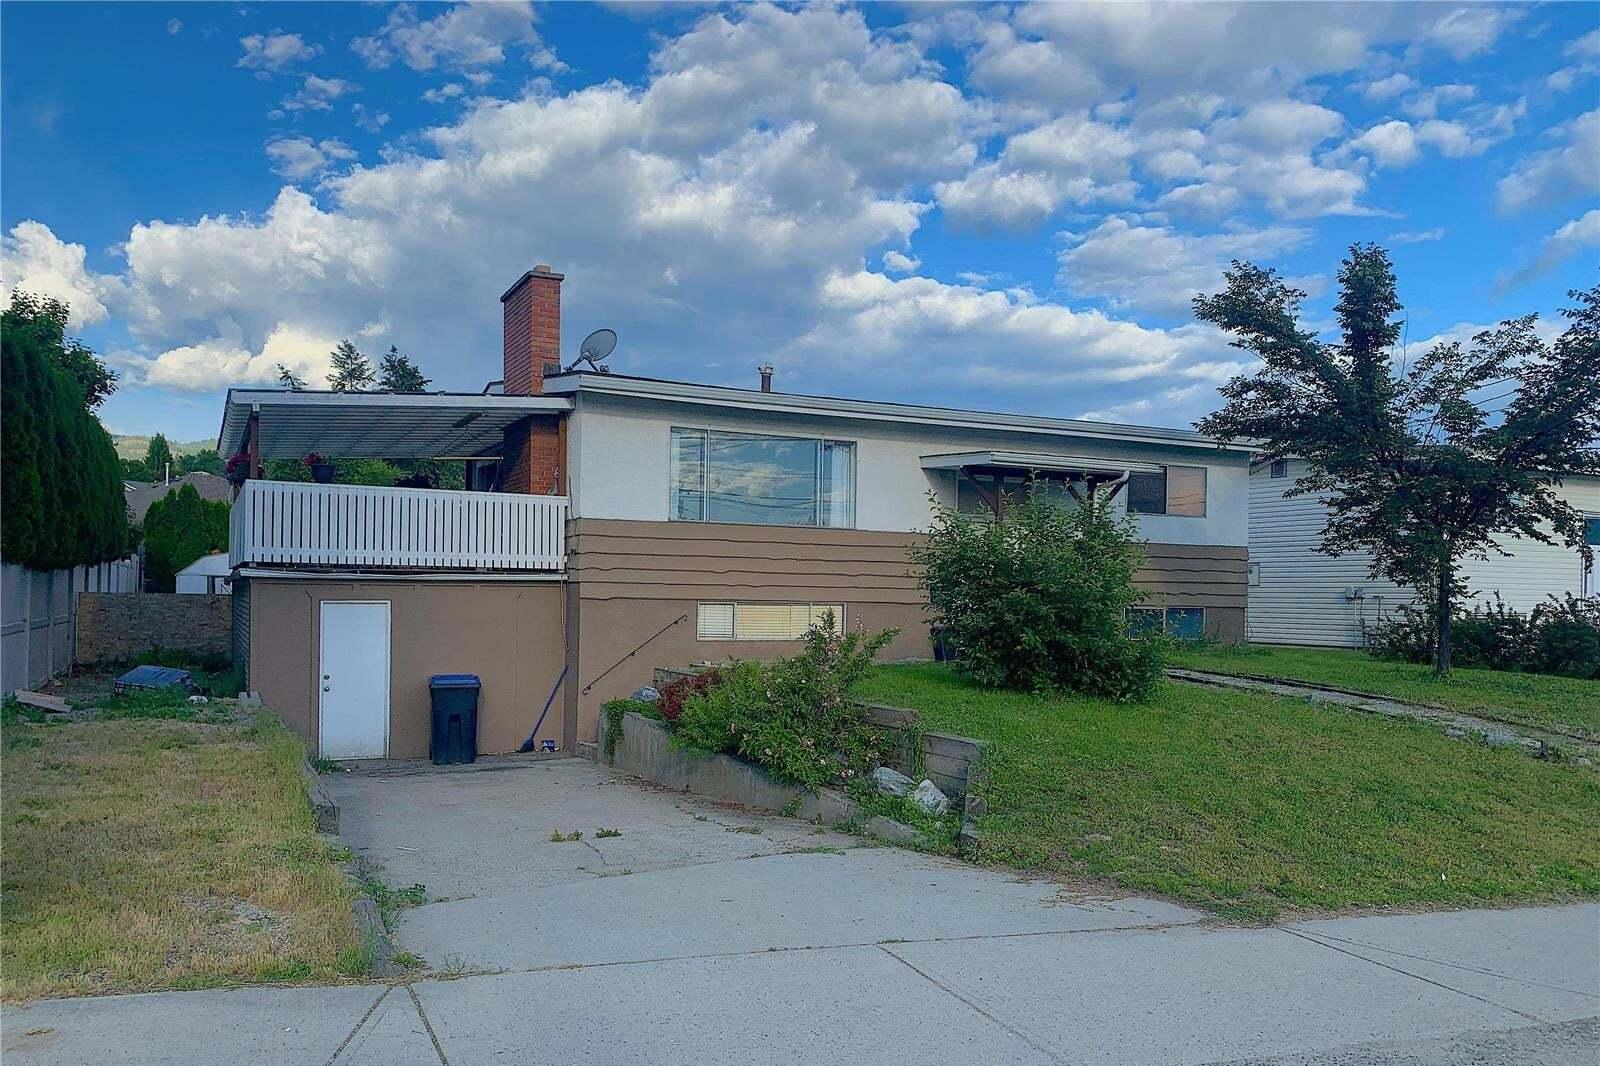 House for sale at 475 Hollywood Rd Kelowna British Columbia - MLS: 10207903